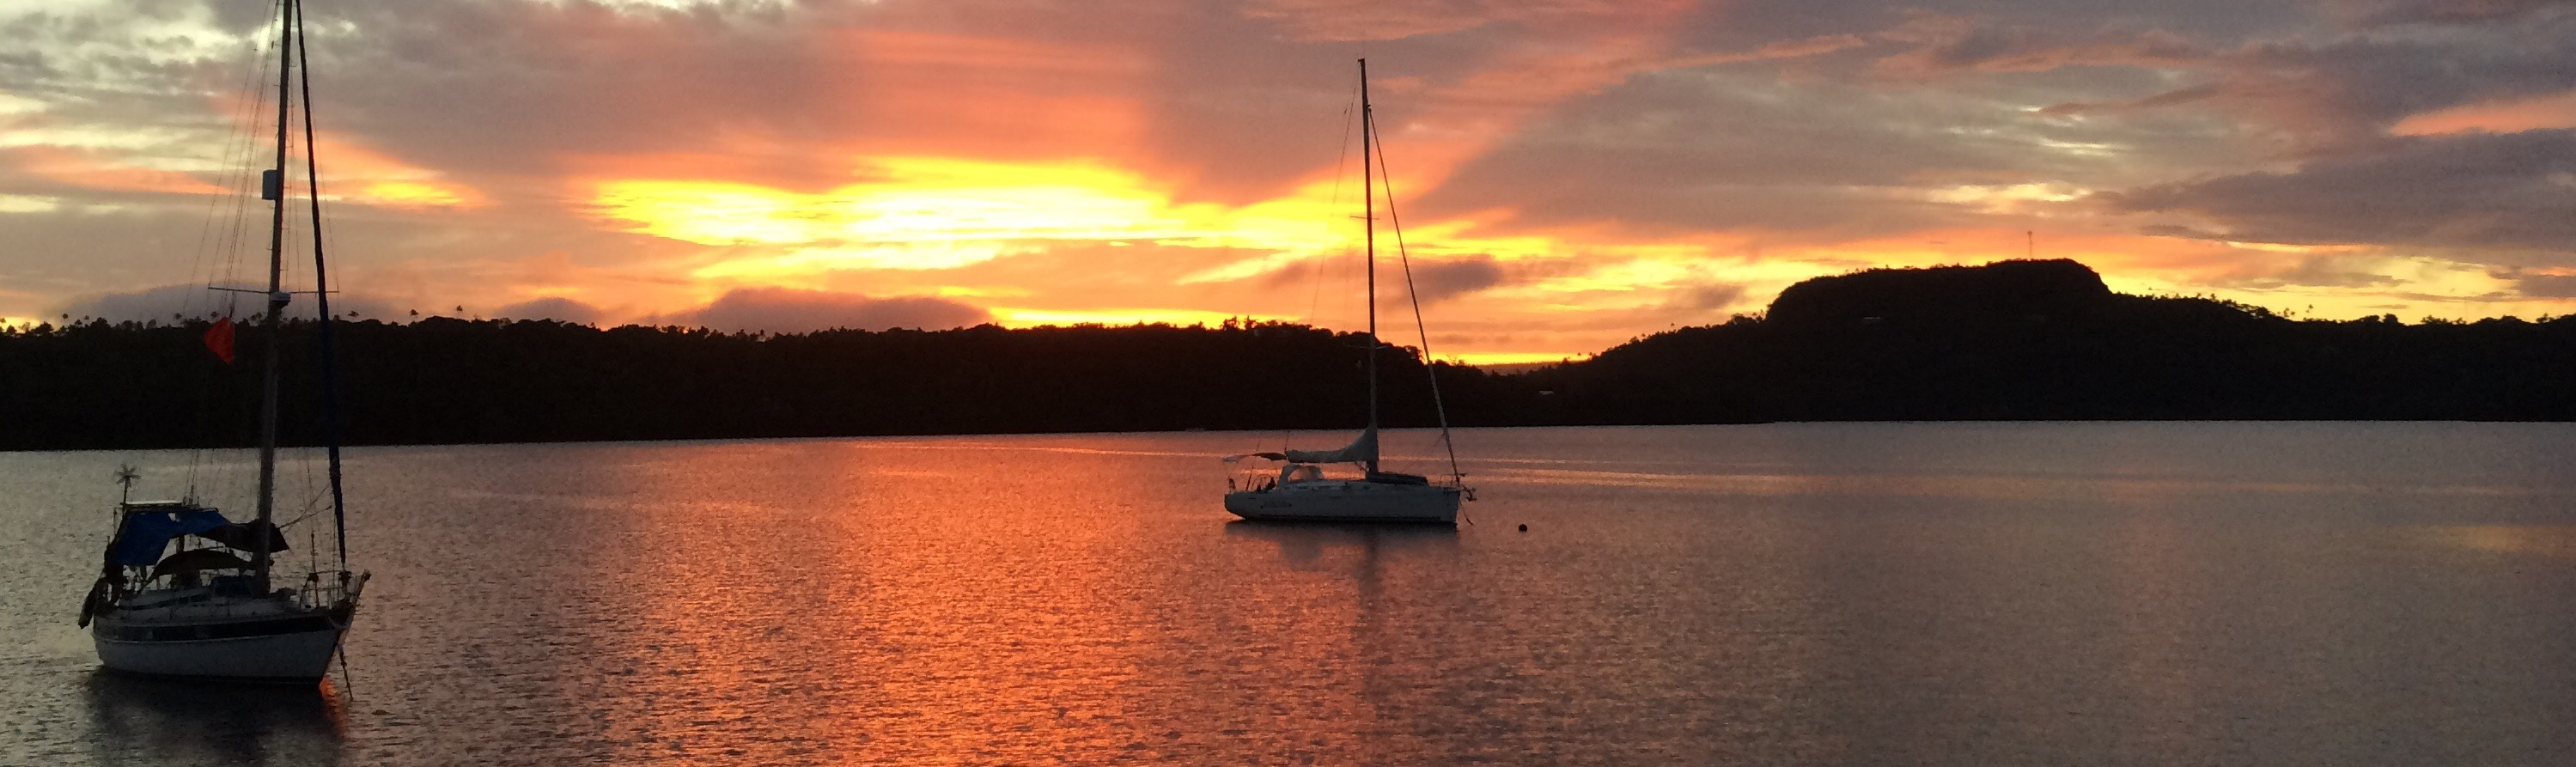 sunset-harbour-copy